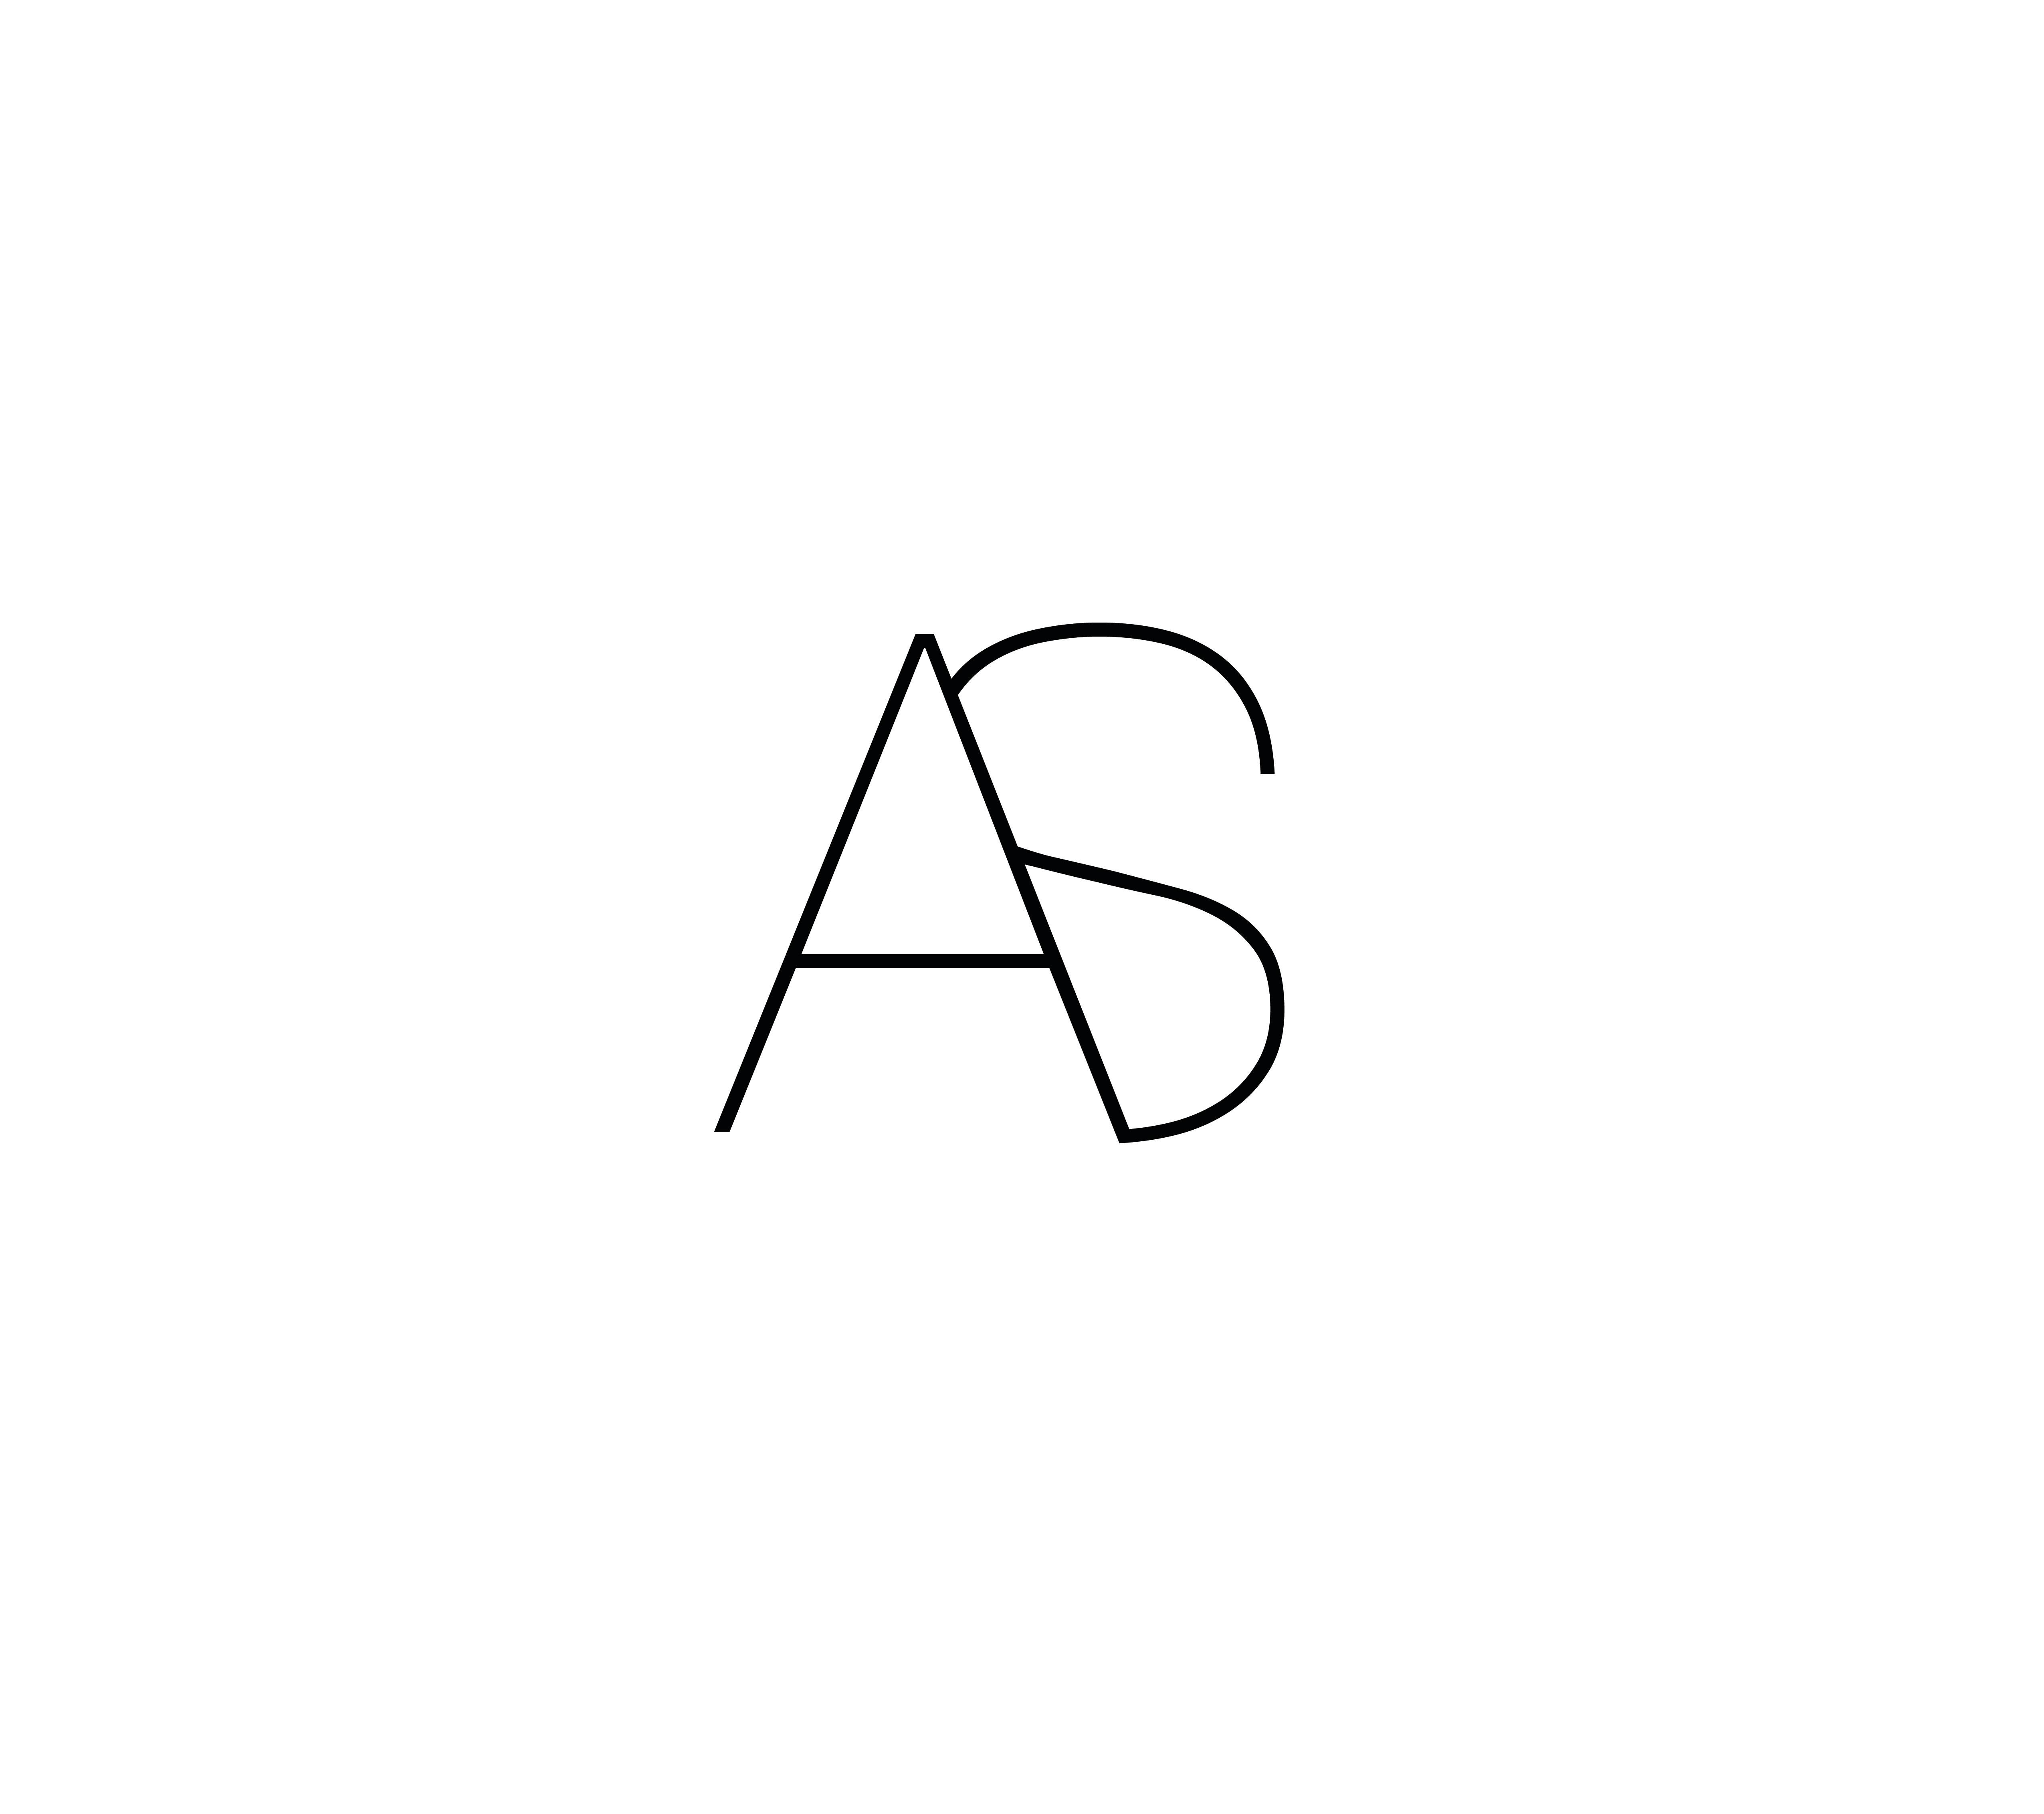 logo4-1-01